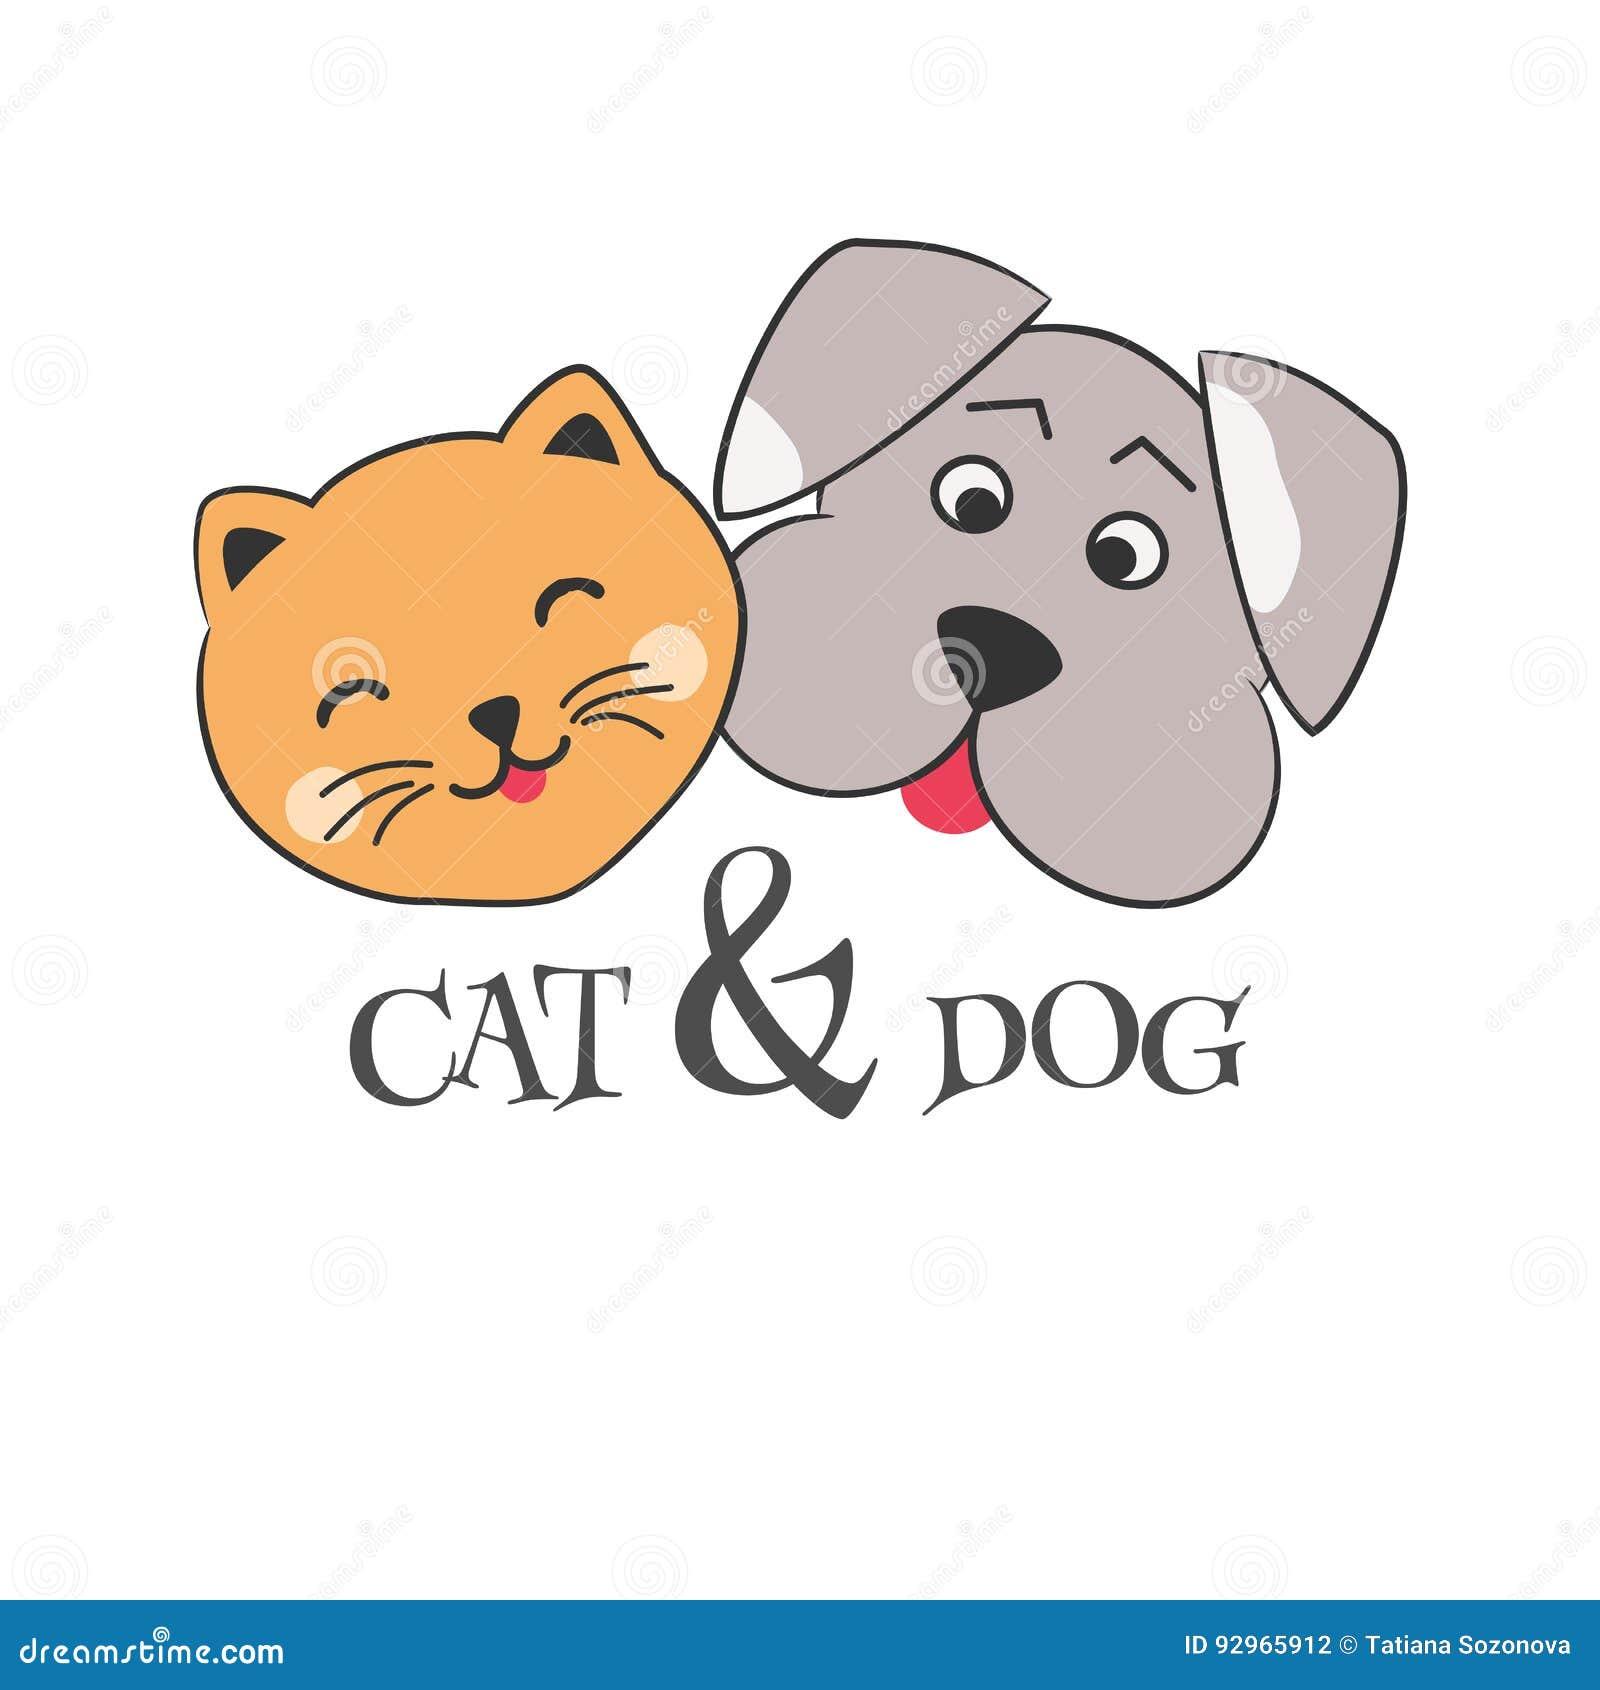 Cute Cartoon Dog And Cat Stock Vector Illustration Of Illustration 92965912